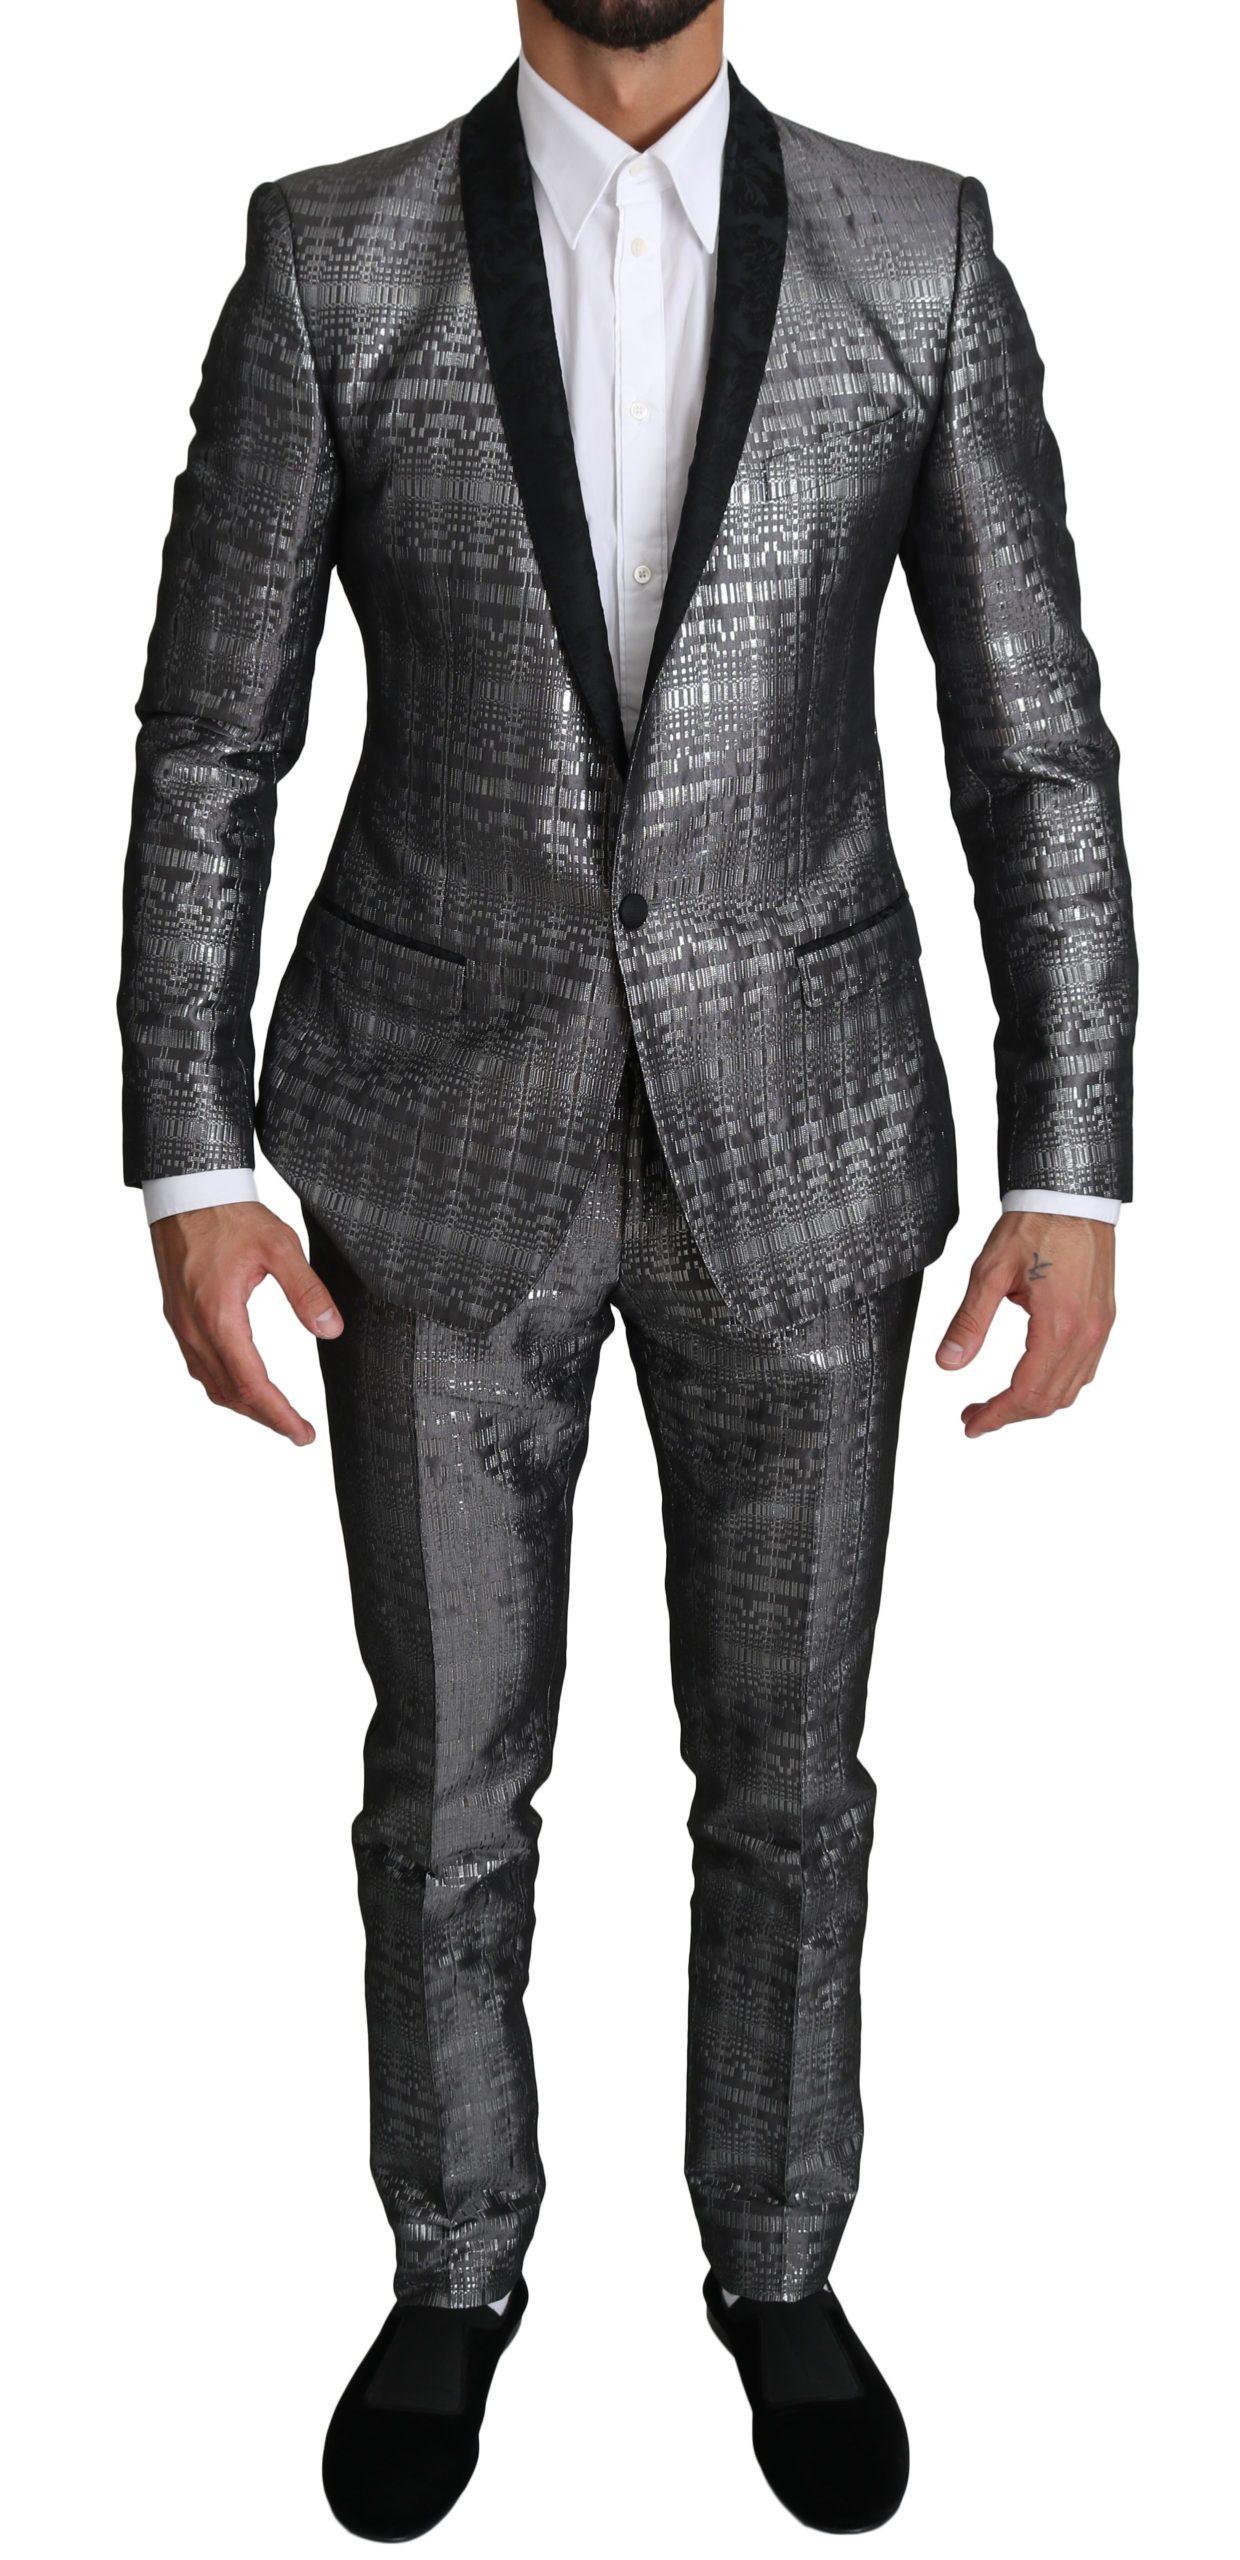 Dolce & Gabbana Men's Single Breasted 2 Piece Suit Silver KOS1547 - IT46   S